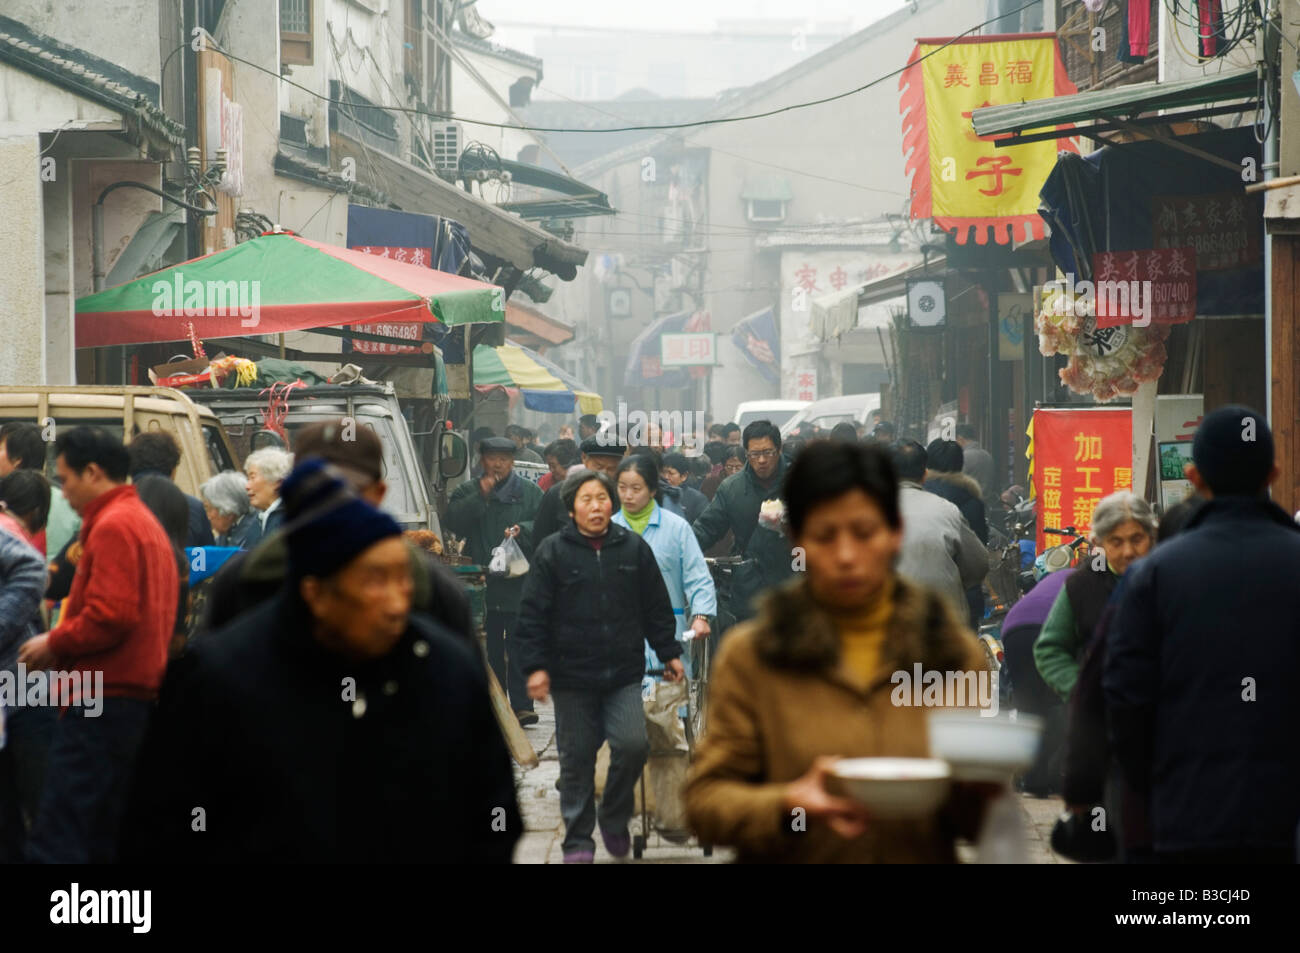 China, Jiangsu Province, Suzhou City. A woman carrying bowls of noodles down a busy street - Stock Image